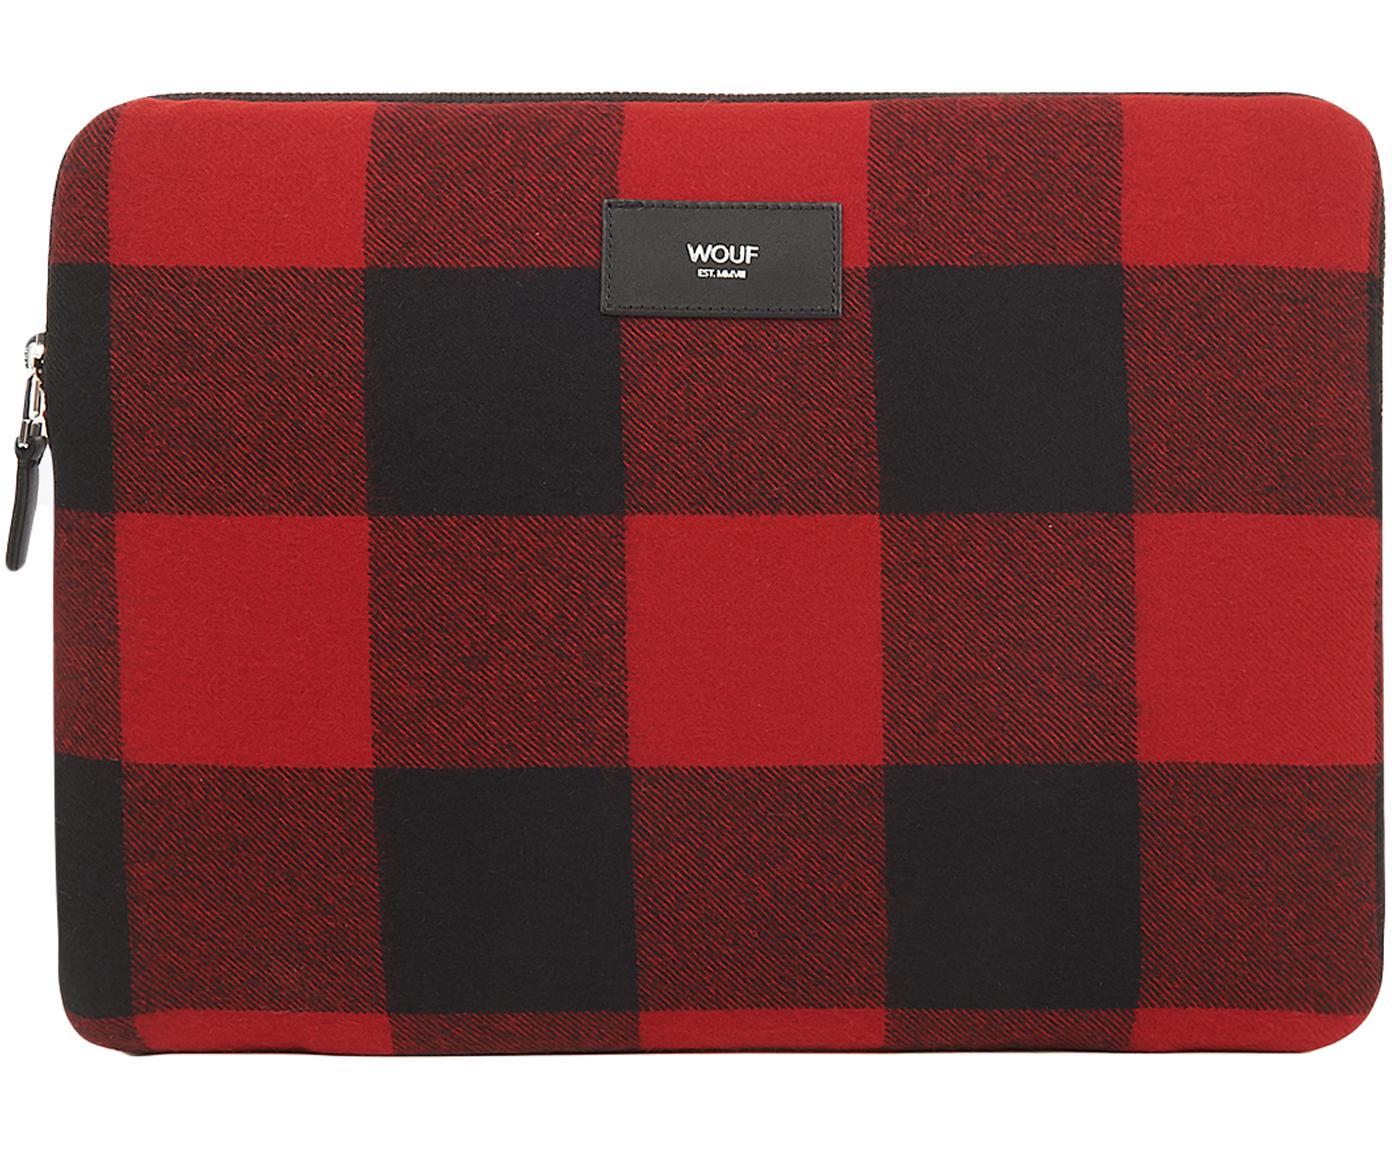 Cover per laptop Red Jack per MacBook Pro 13 pollici, Cotone, pelle, Rosso, nero, Larg. 33 x Alt. 23 cm